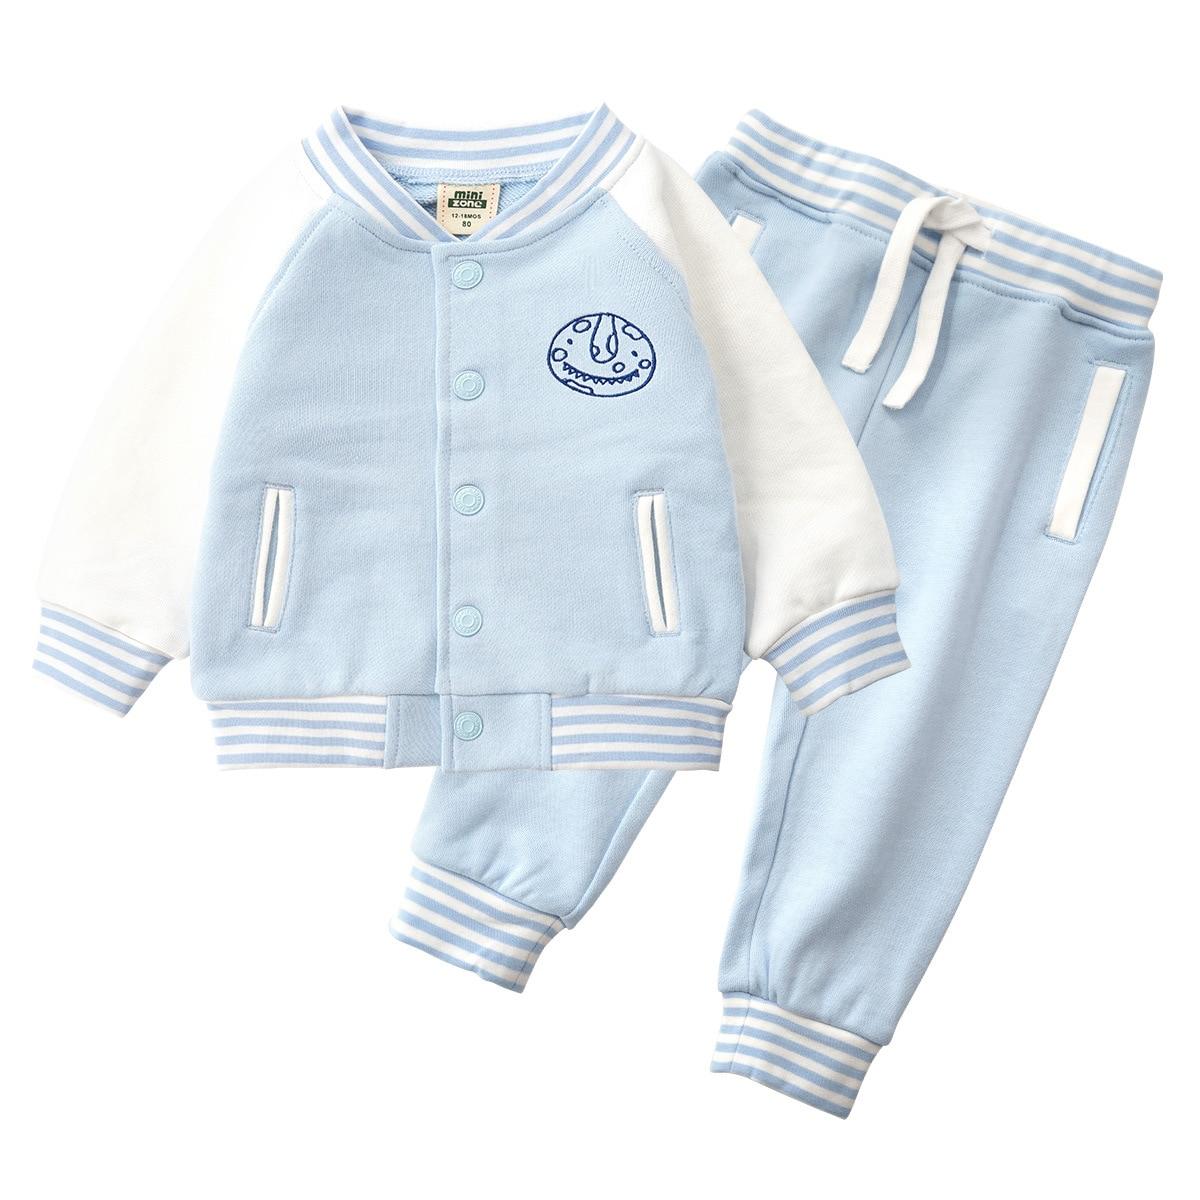 цена на 2018 Children Baseball Suit 2-piece set Baby Boy Sports Sweater Autumn Unisex Active Print Suits cotton warm fasion outer wear